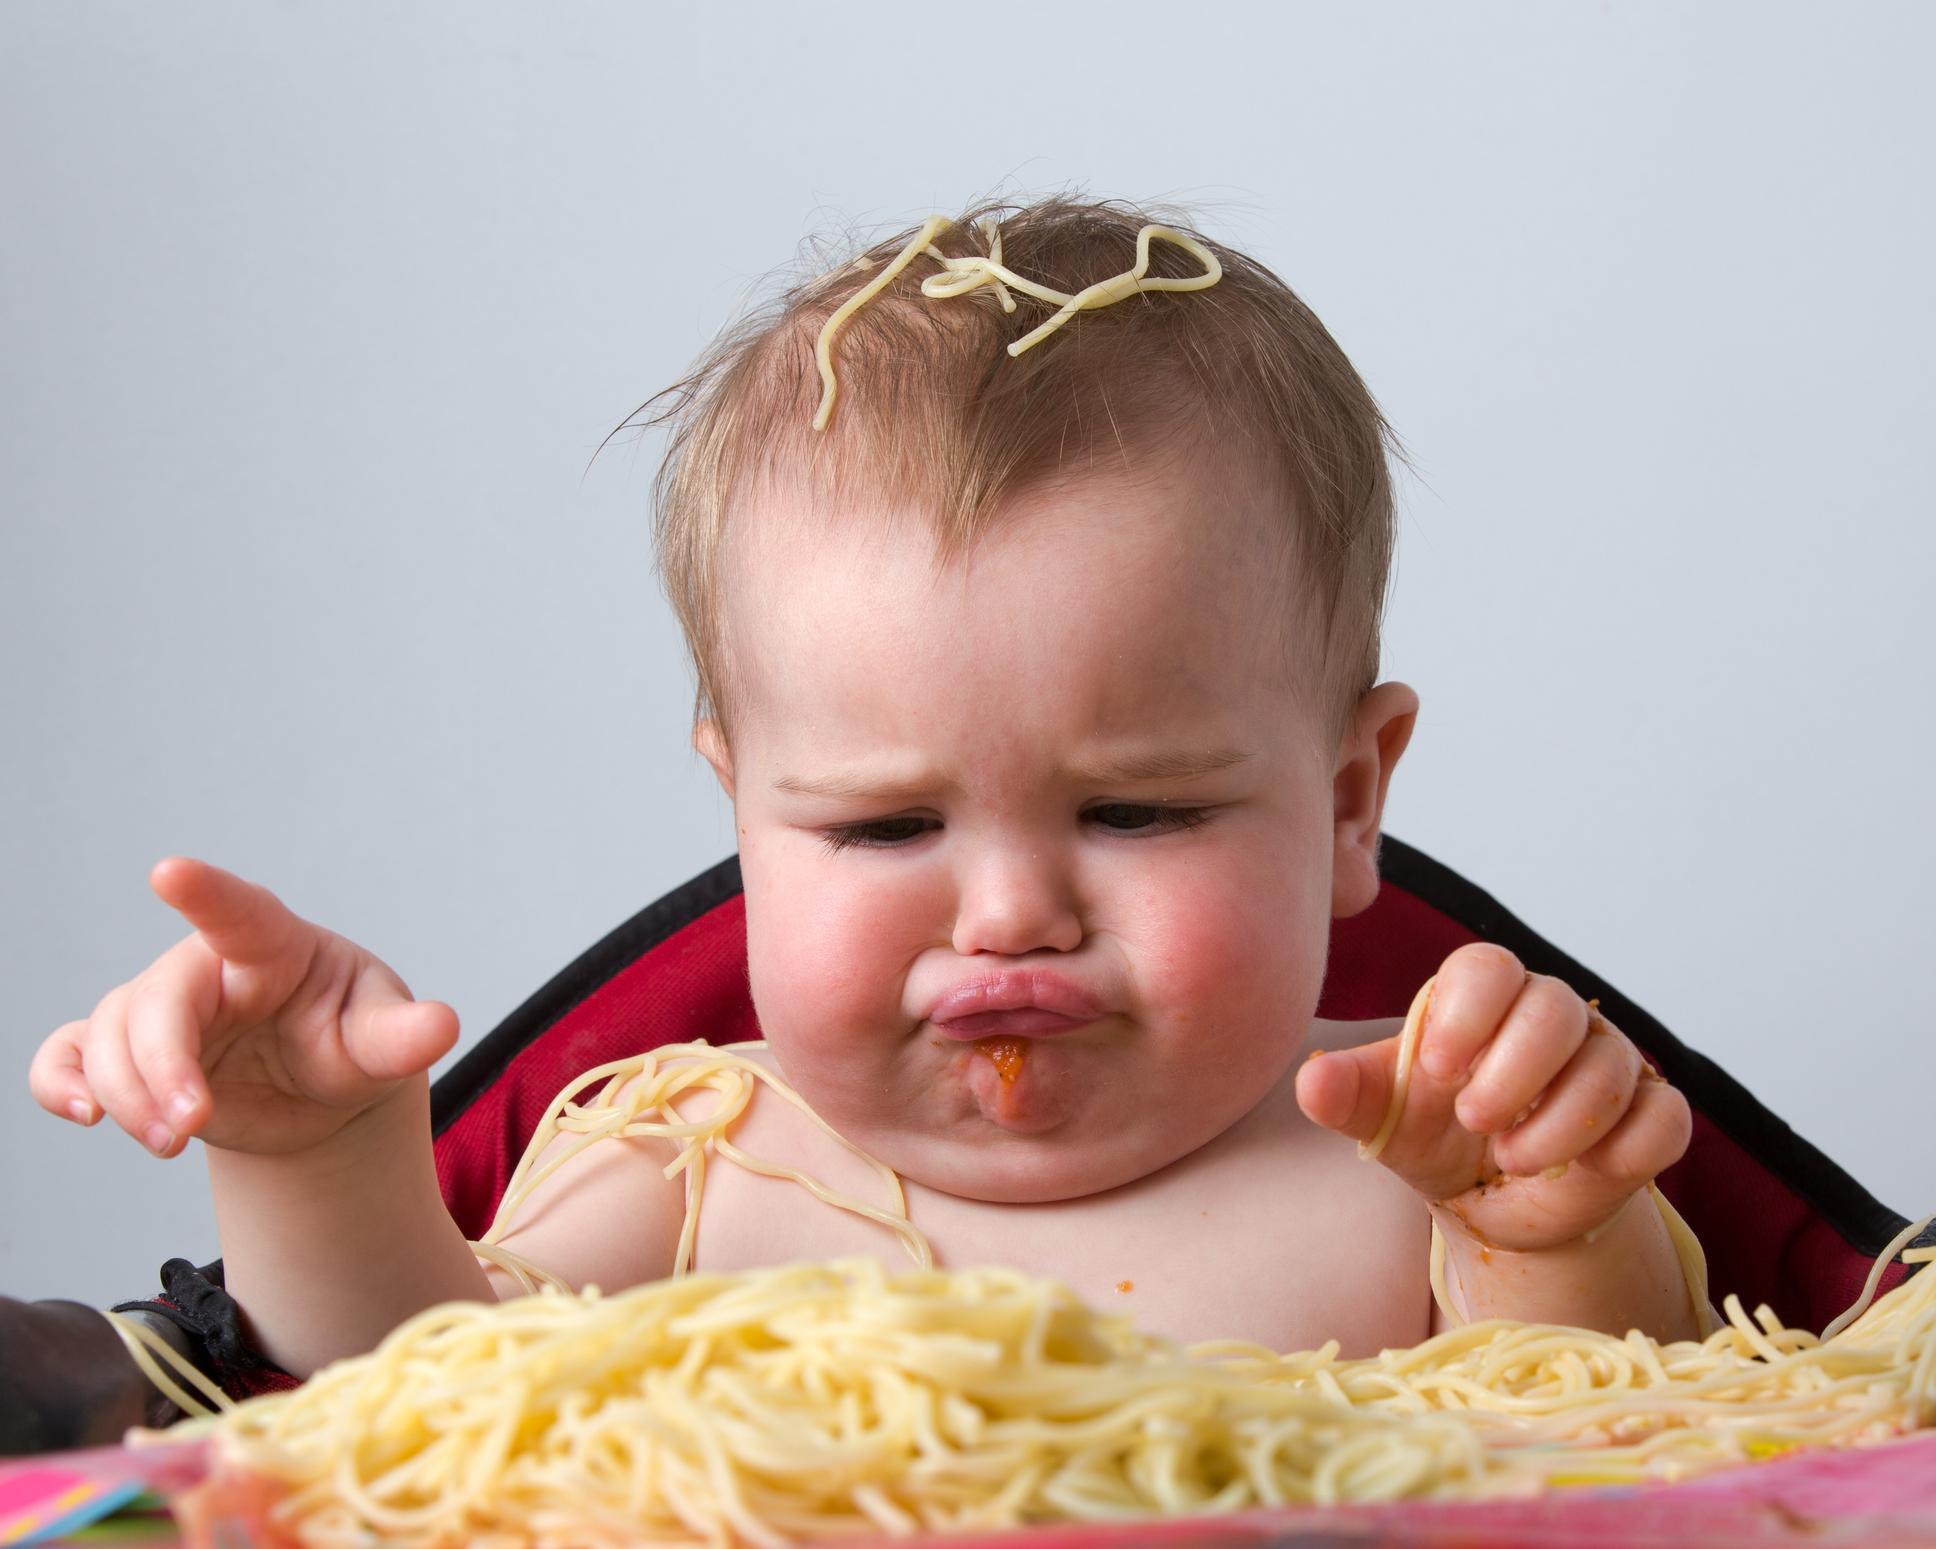 baby eating spaghetti